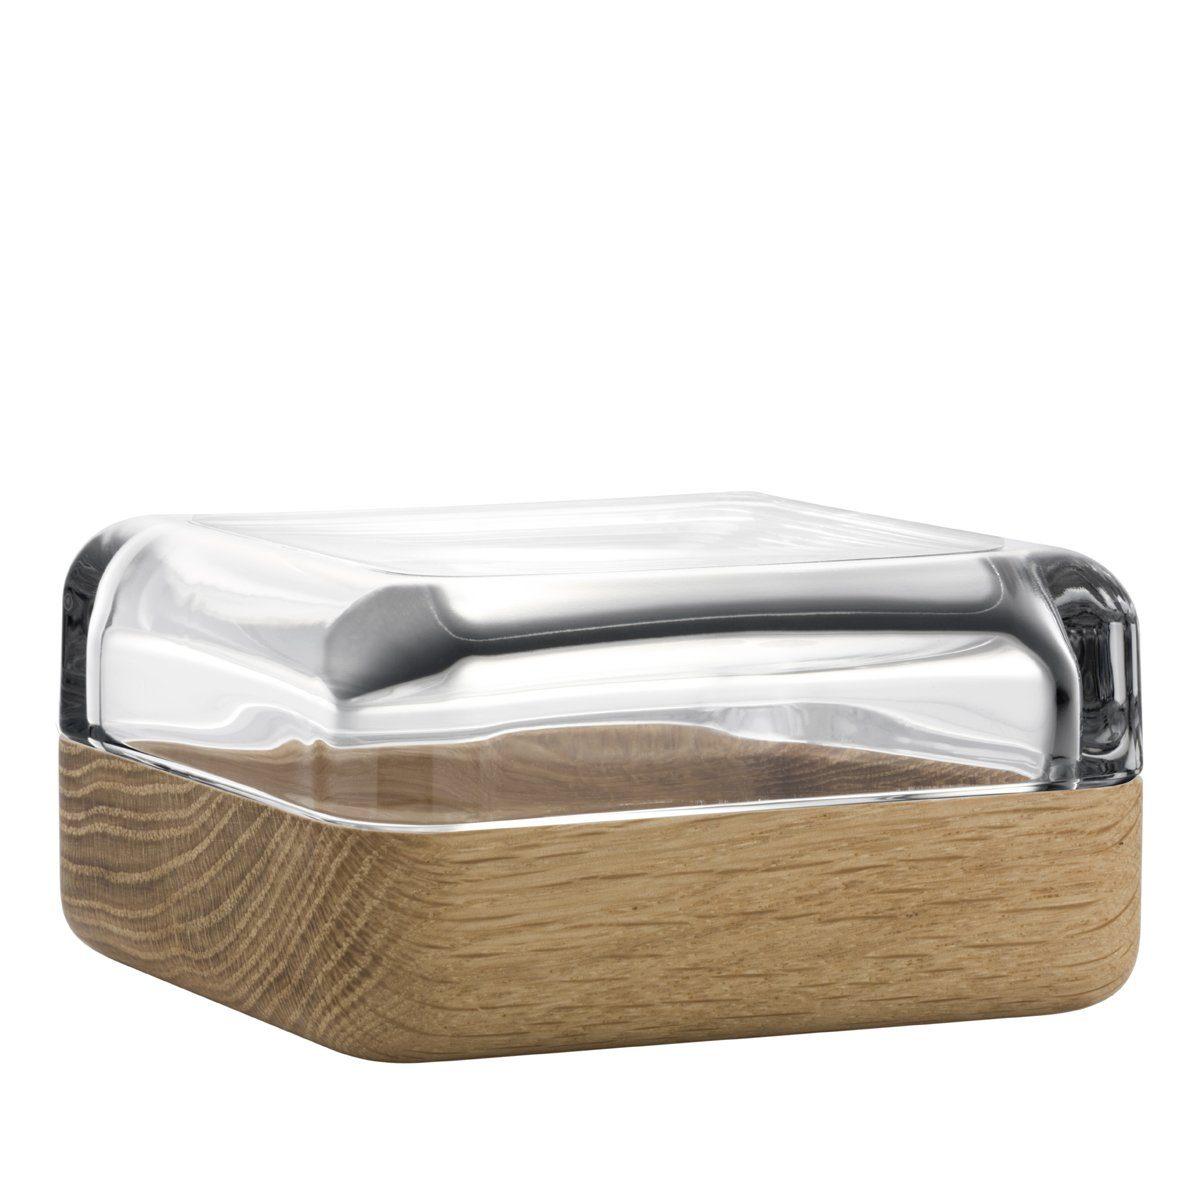 IITTALA Iittala VITRIINI Glasbox 10.8 cm klar/Eiche